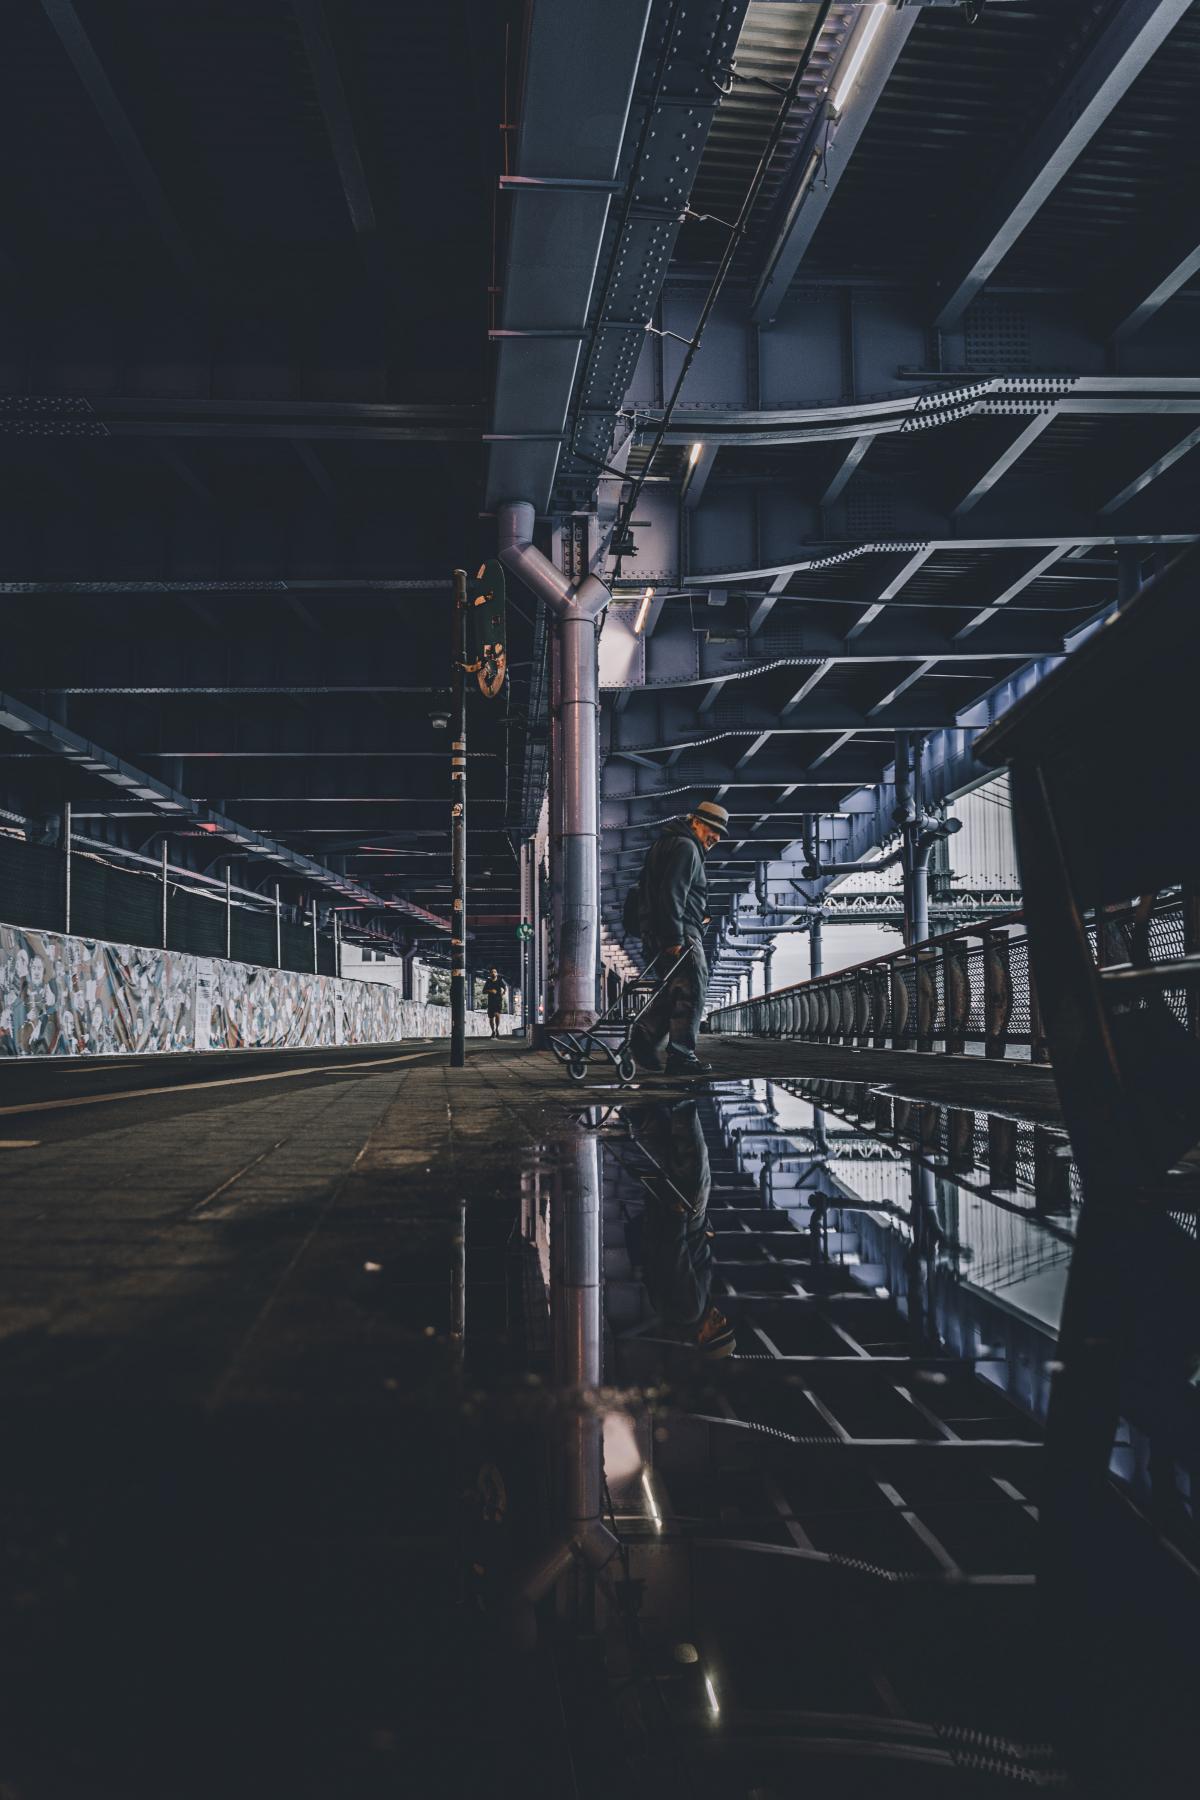 Cable Structure Pier #422246